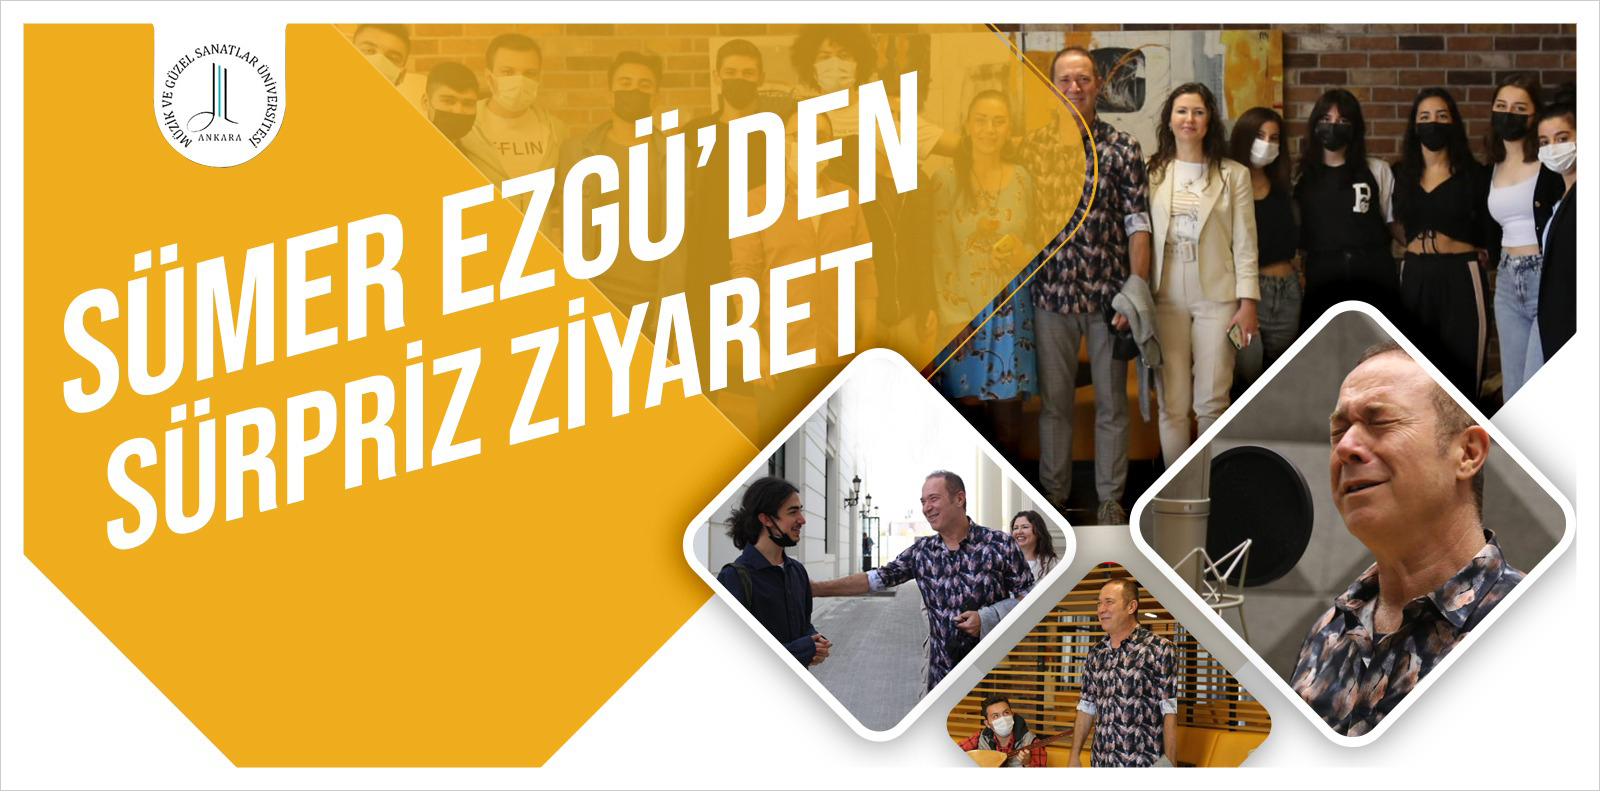 Sümer Ezgü'den Süpriz Ziyaret Slide